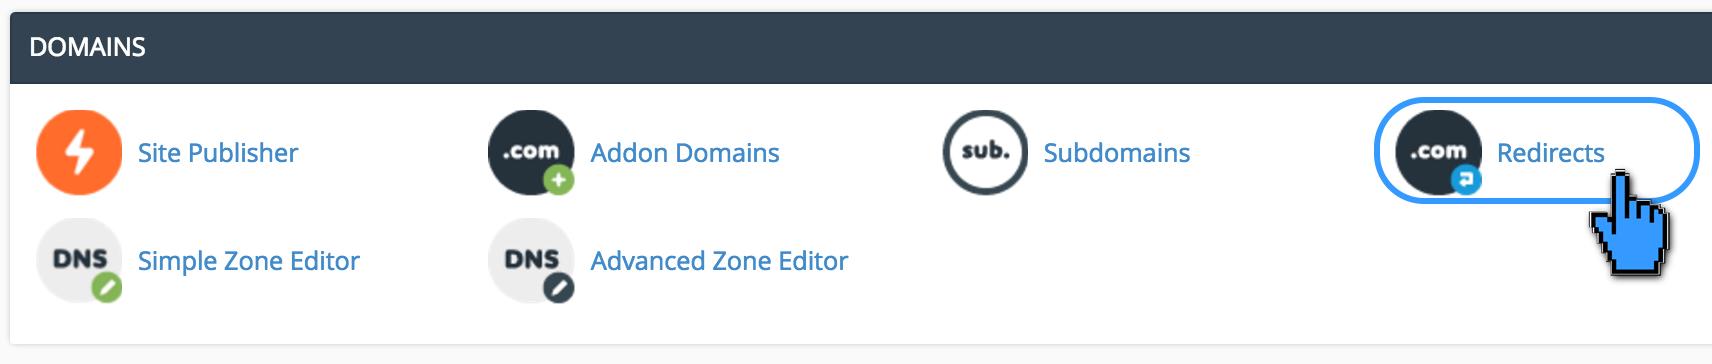 Cara Redirects Domain Melalui Cpanel 2